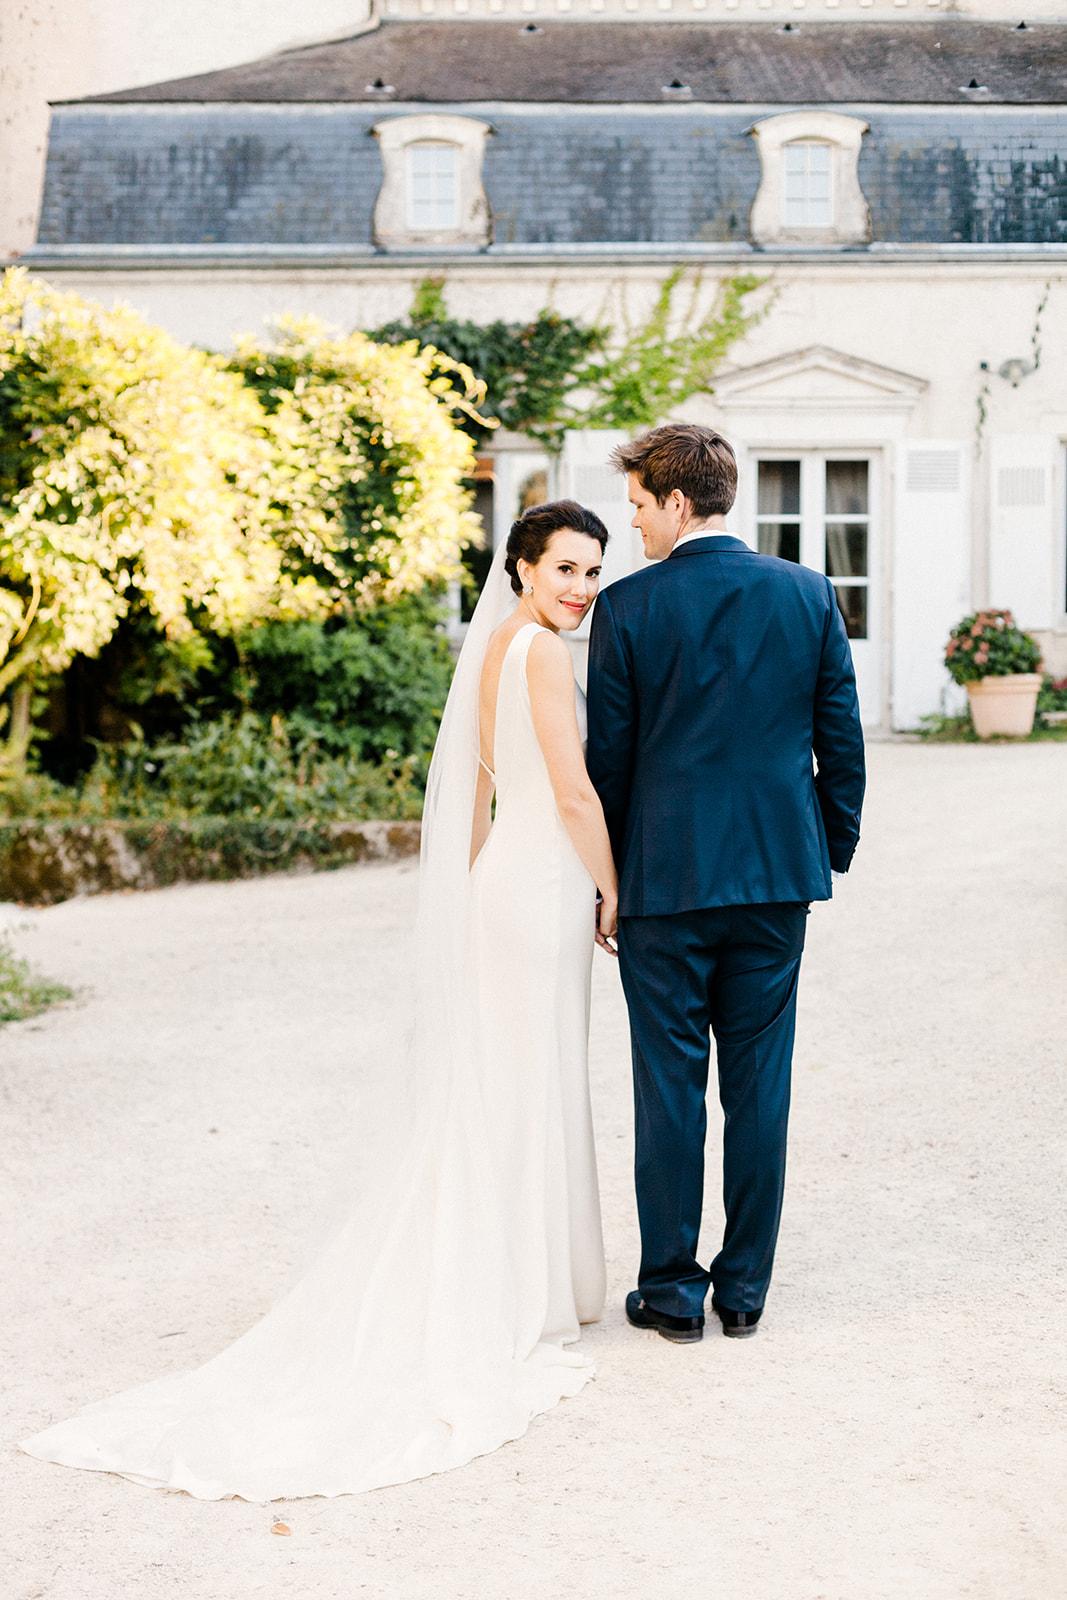 French Chateau Wedding, Events by Reagan, France Wedding, Destination Wedding Planner, Bride and Groom